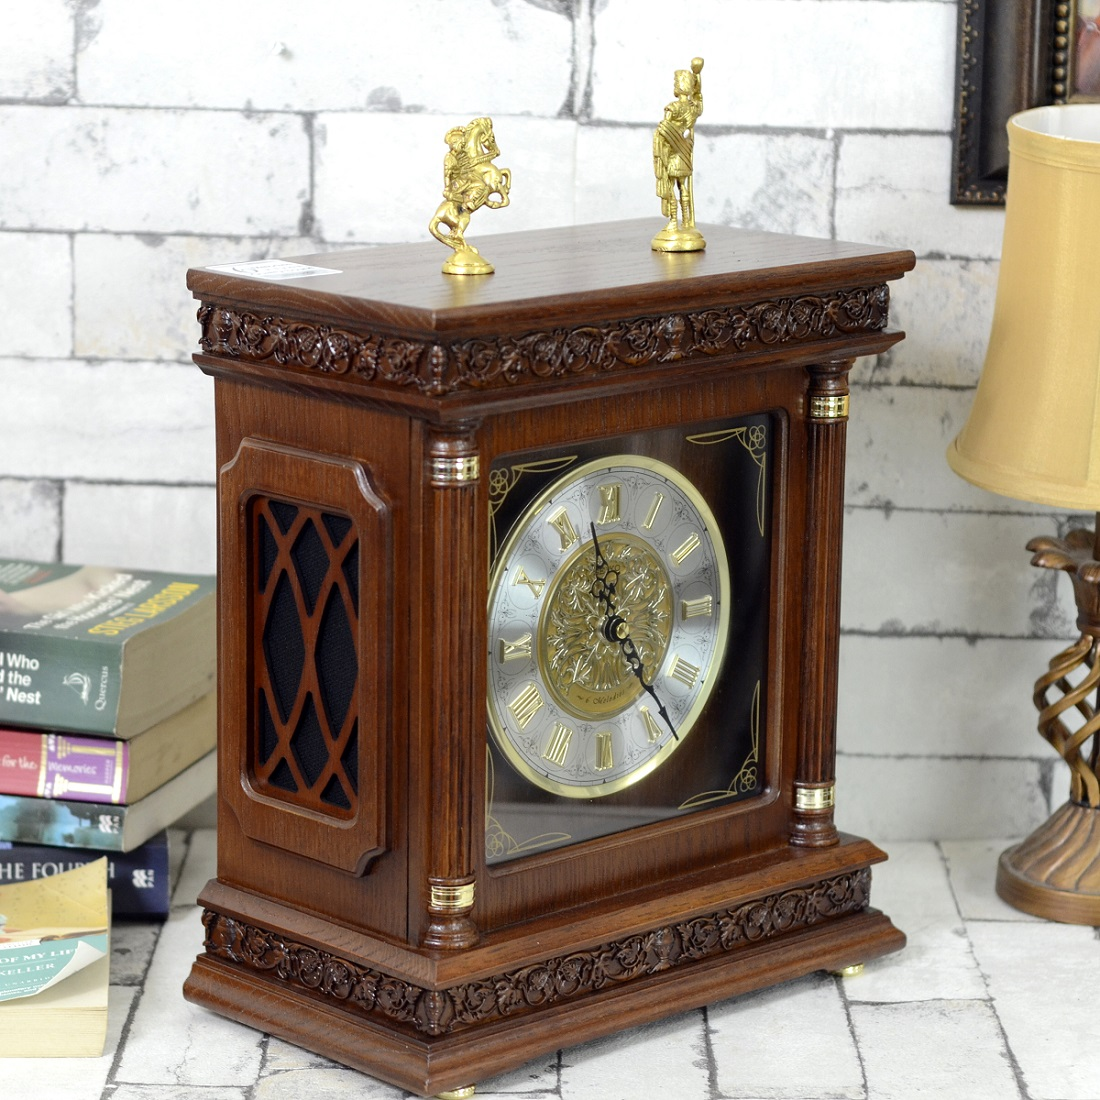 Antikcart Antique Roman Tower Type Seiko Mantel Clock Side View